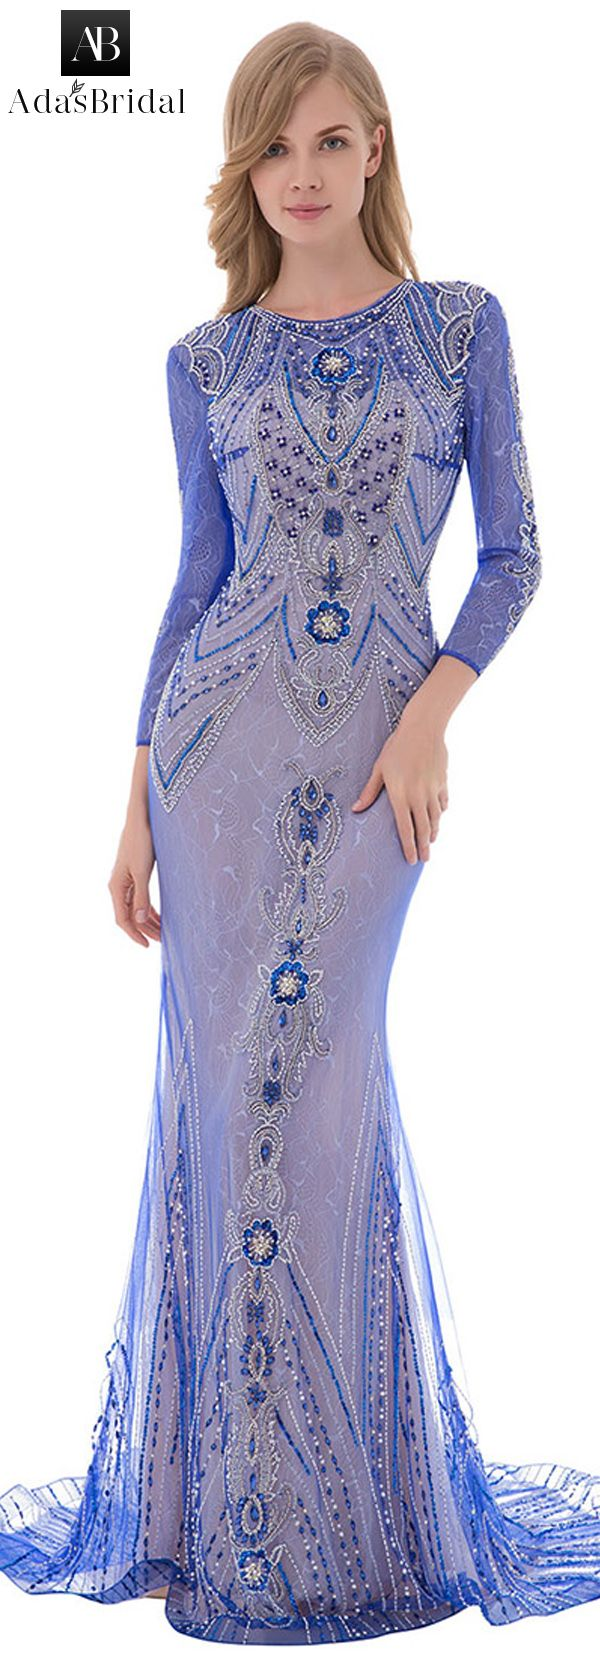 Country wedding mother dresses  Shining Tulle u Lace Jewel Neckline Floorlength SheathColumn